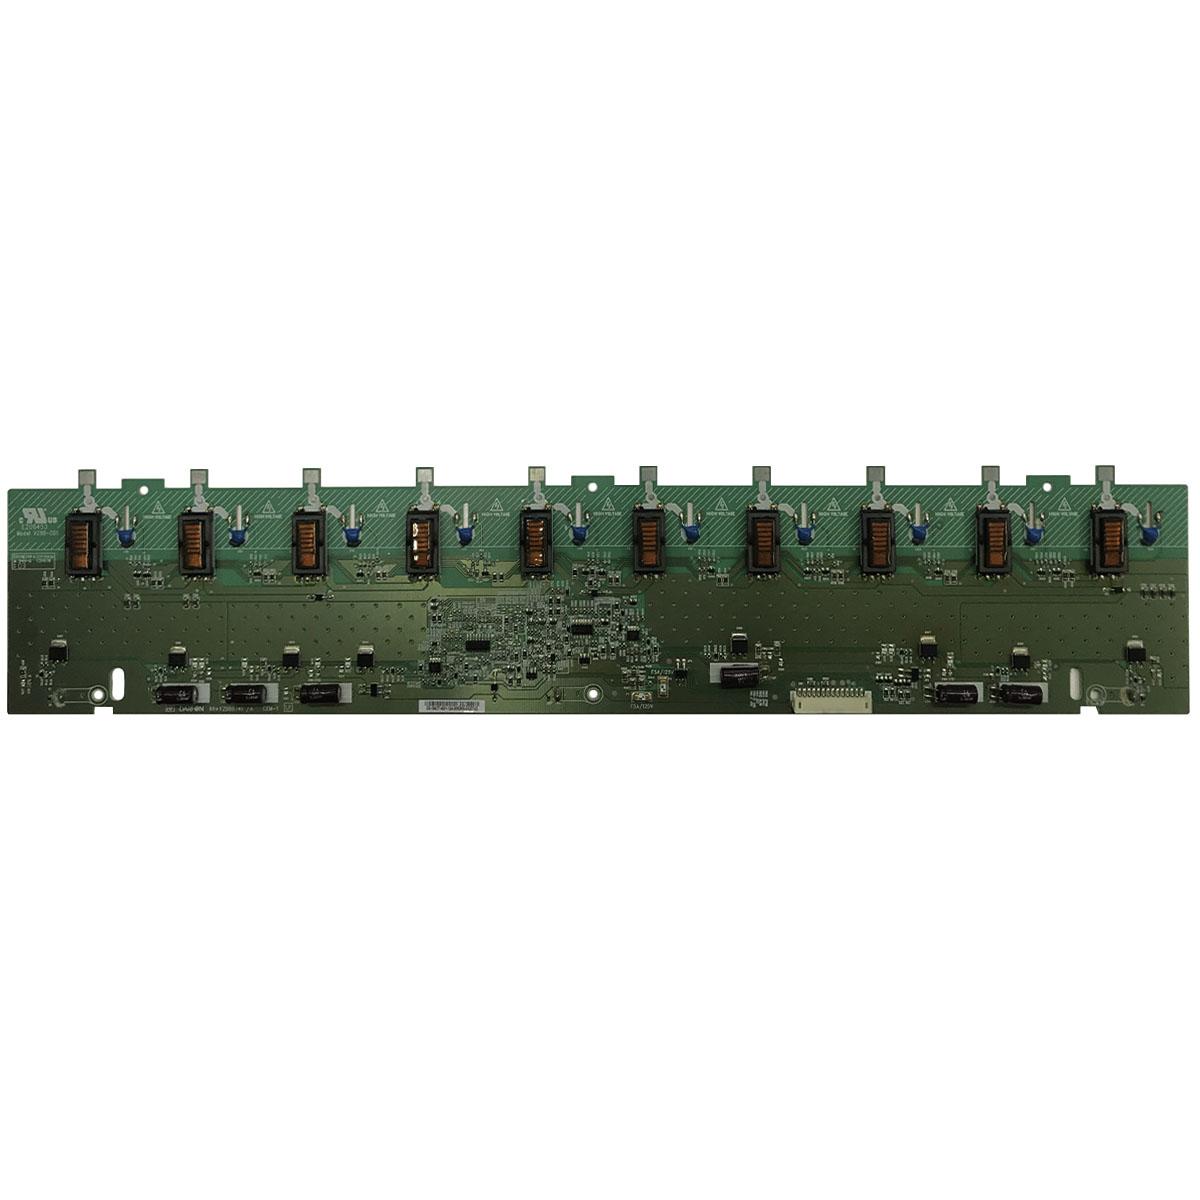 Инвертор T871-135.00 V298-C01 для LG 42LK451